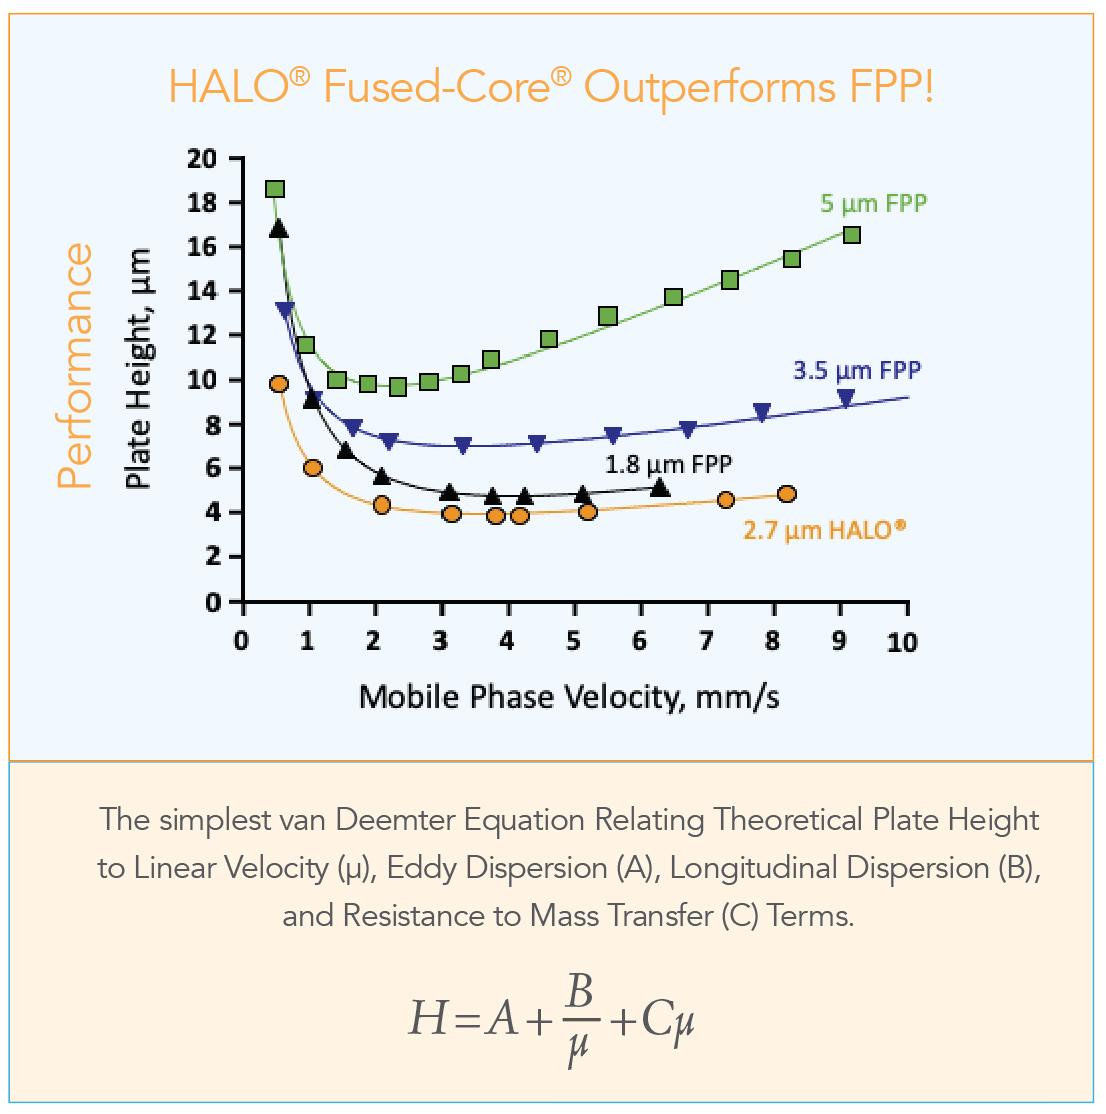 chromatograph report on halo vs fpp